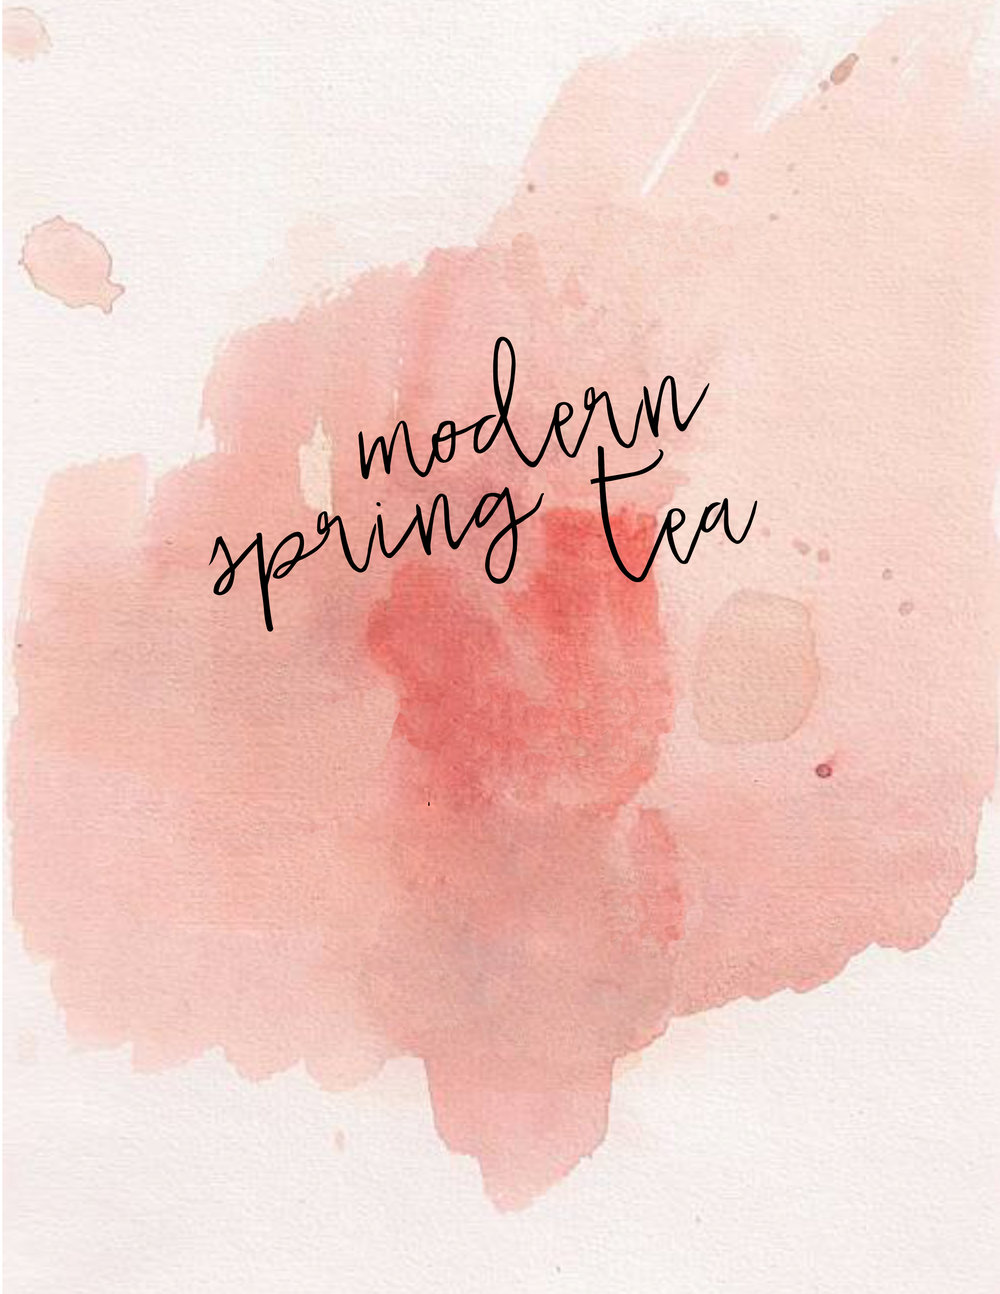 Modern_Tea_Artwork.jpg